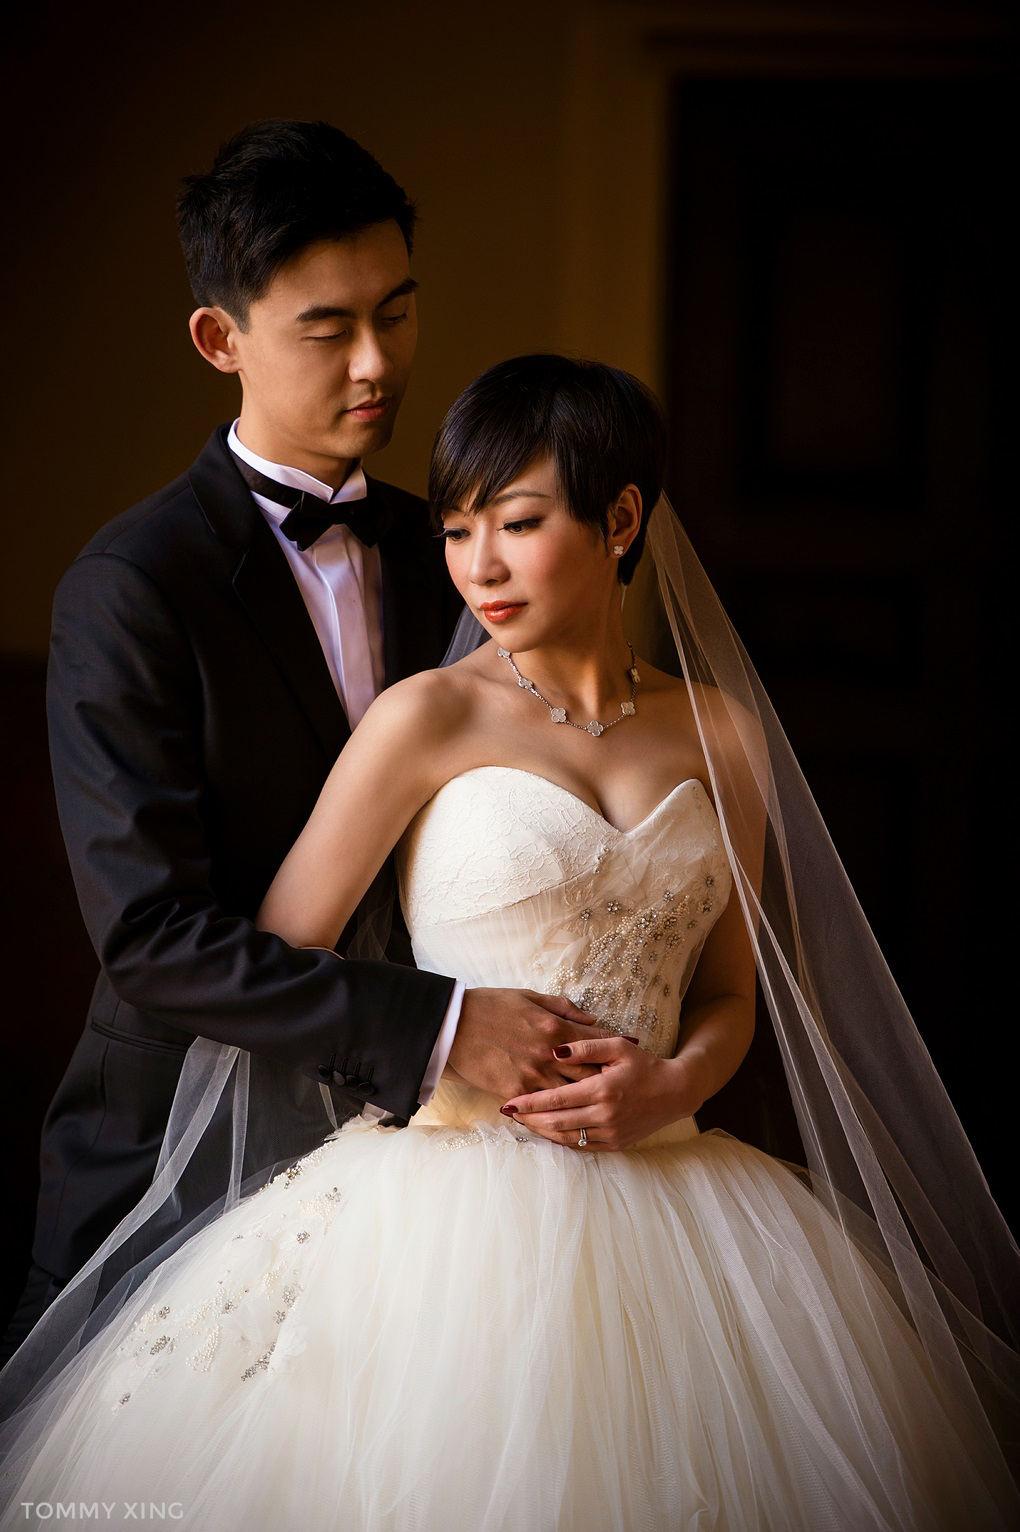 洛杉矶婚纱照 - Los Angeles Pre Wedding - Tommy Xing06.jpg